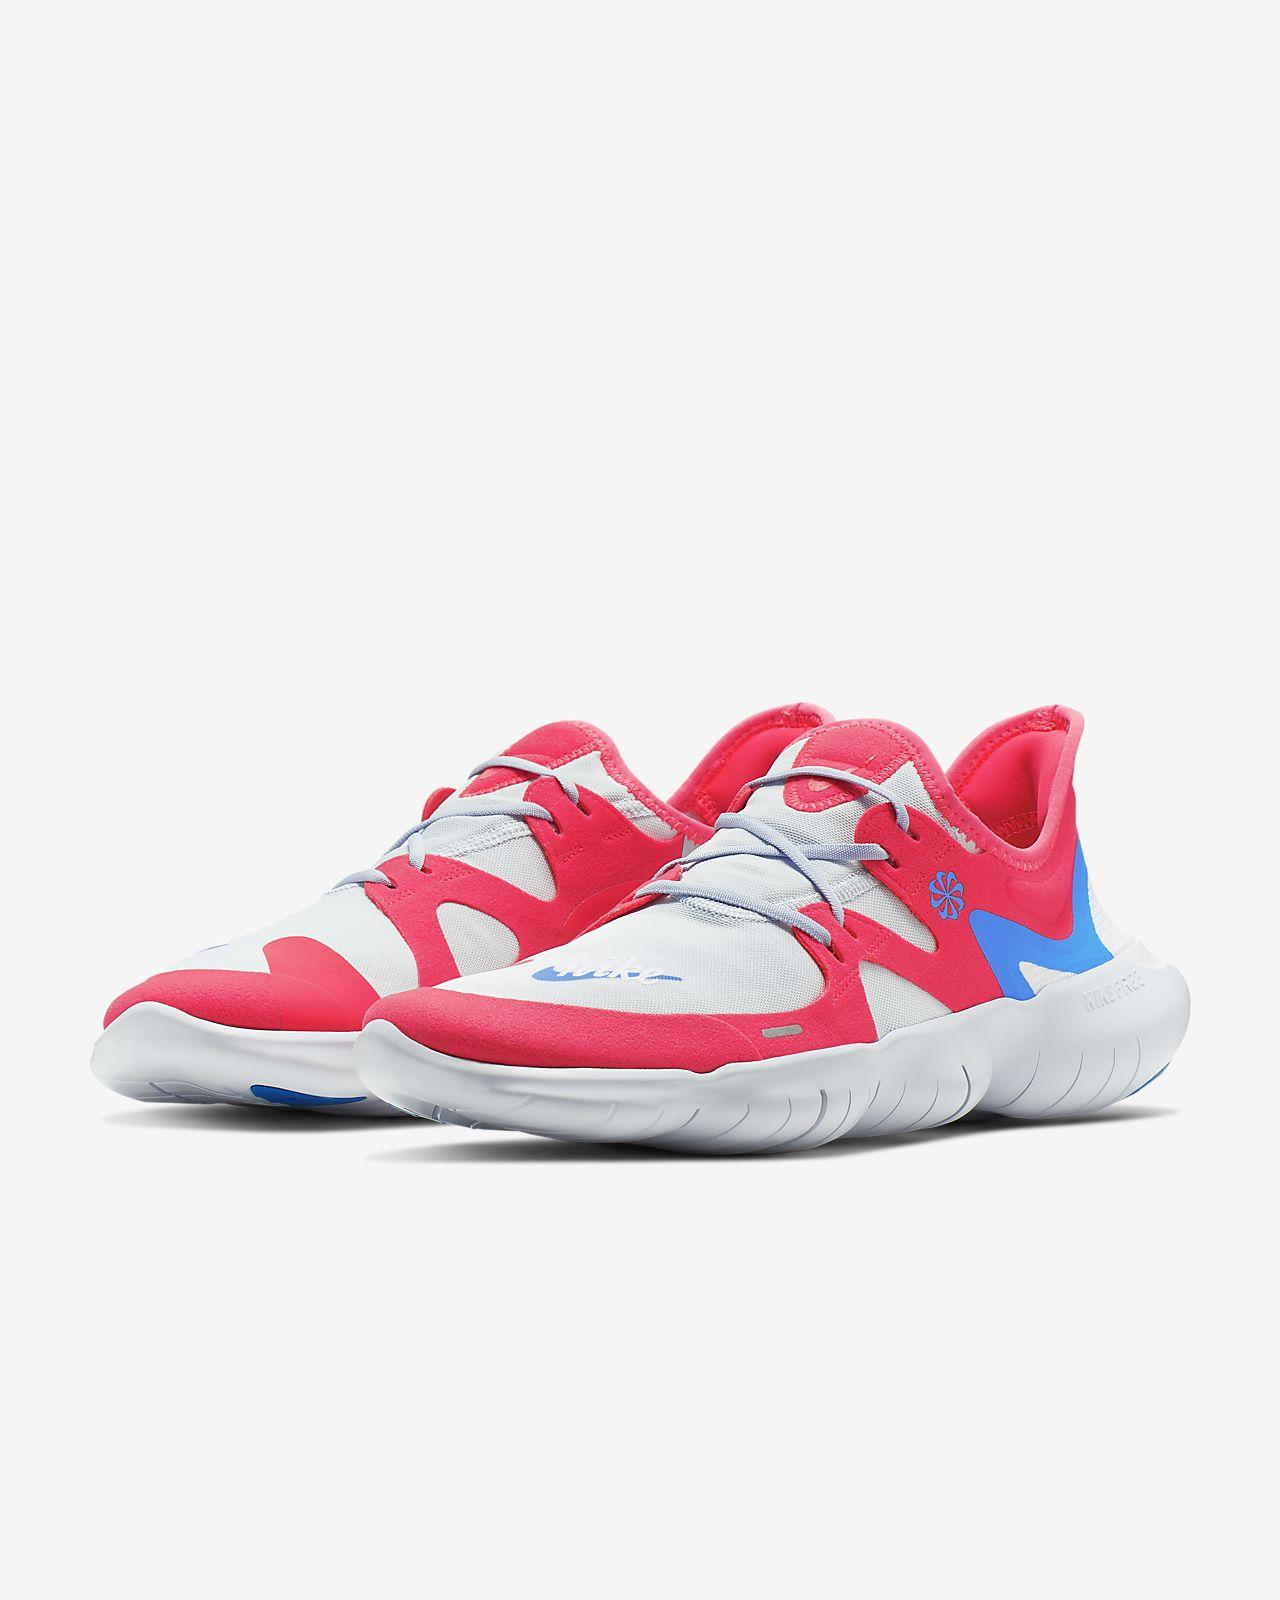 Nike Free Run Pink : Nike Free 5.0